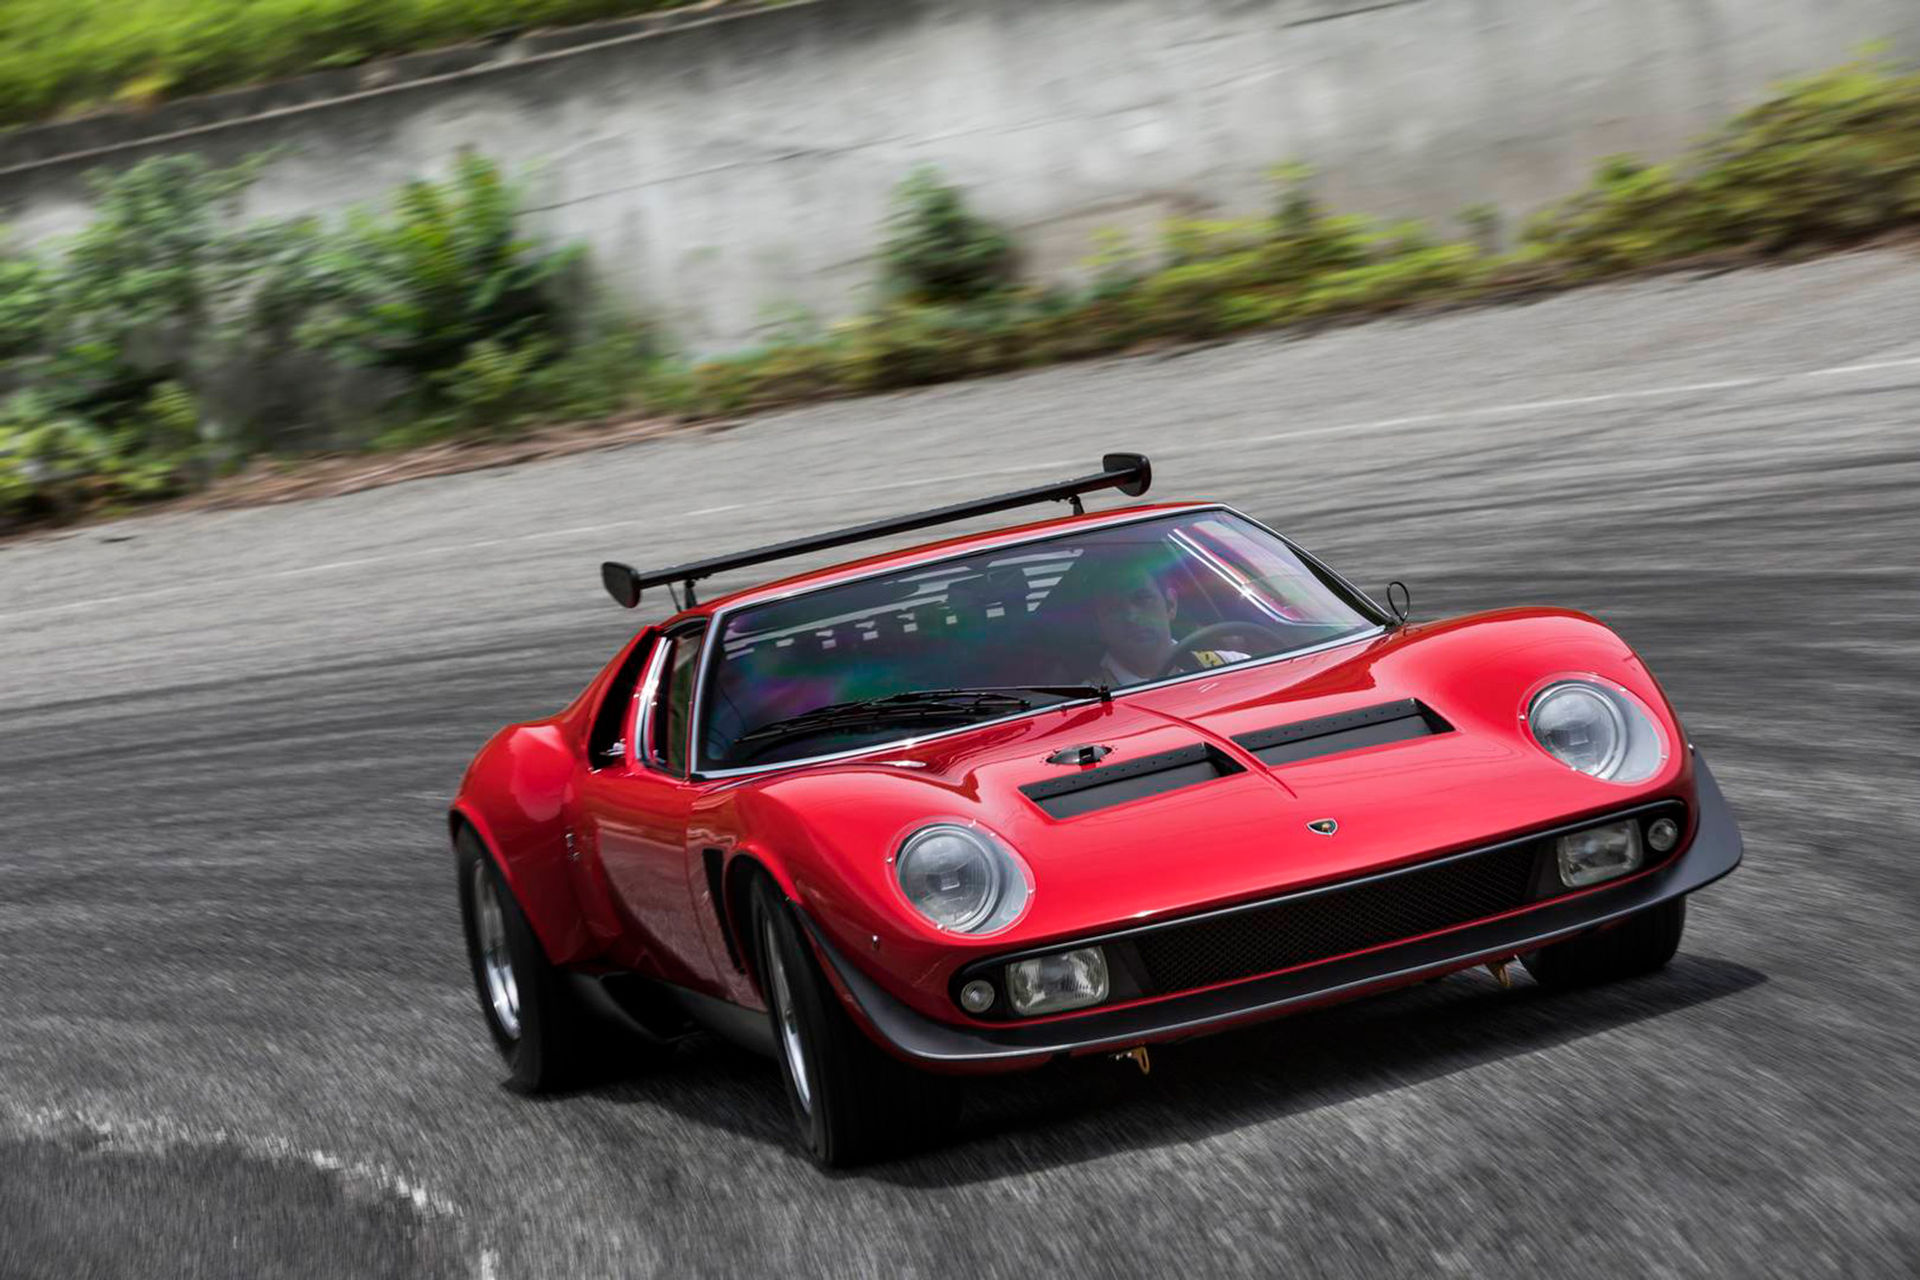 Världens enda Lamborghini Miura SVR har renoverats